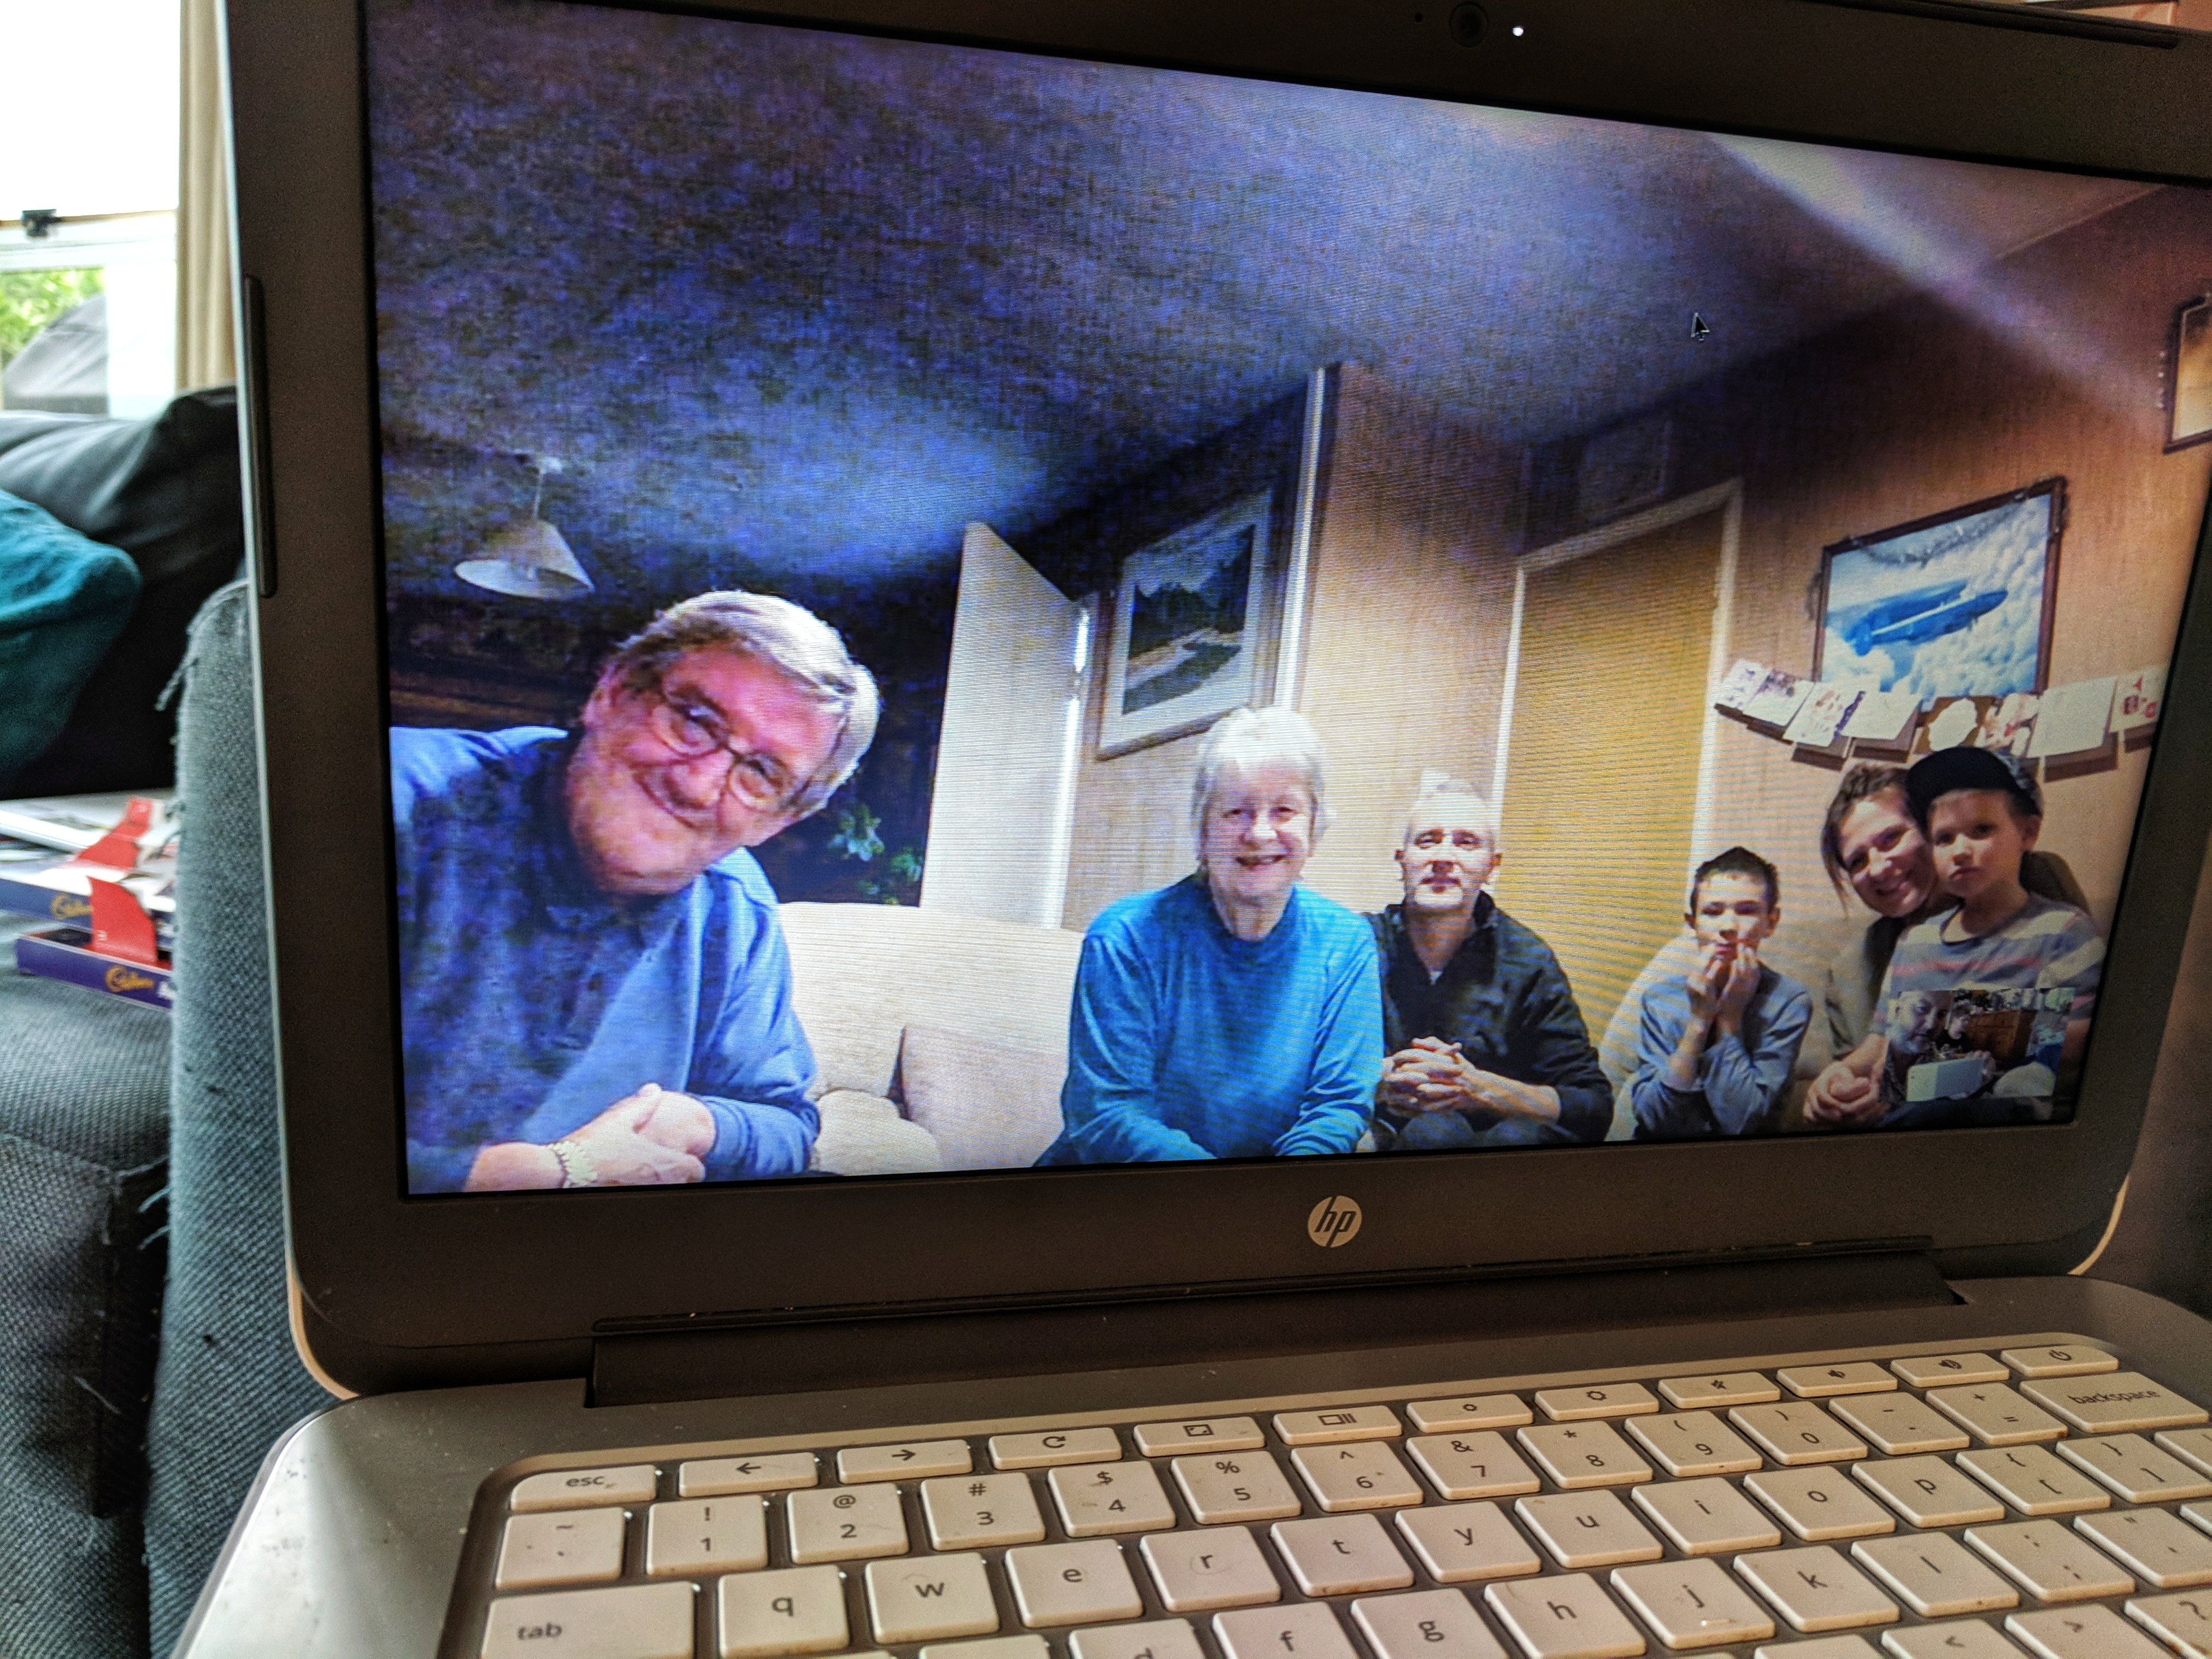 Family Christmas connection via laptop